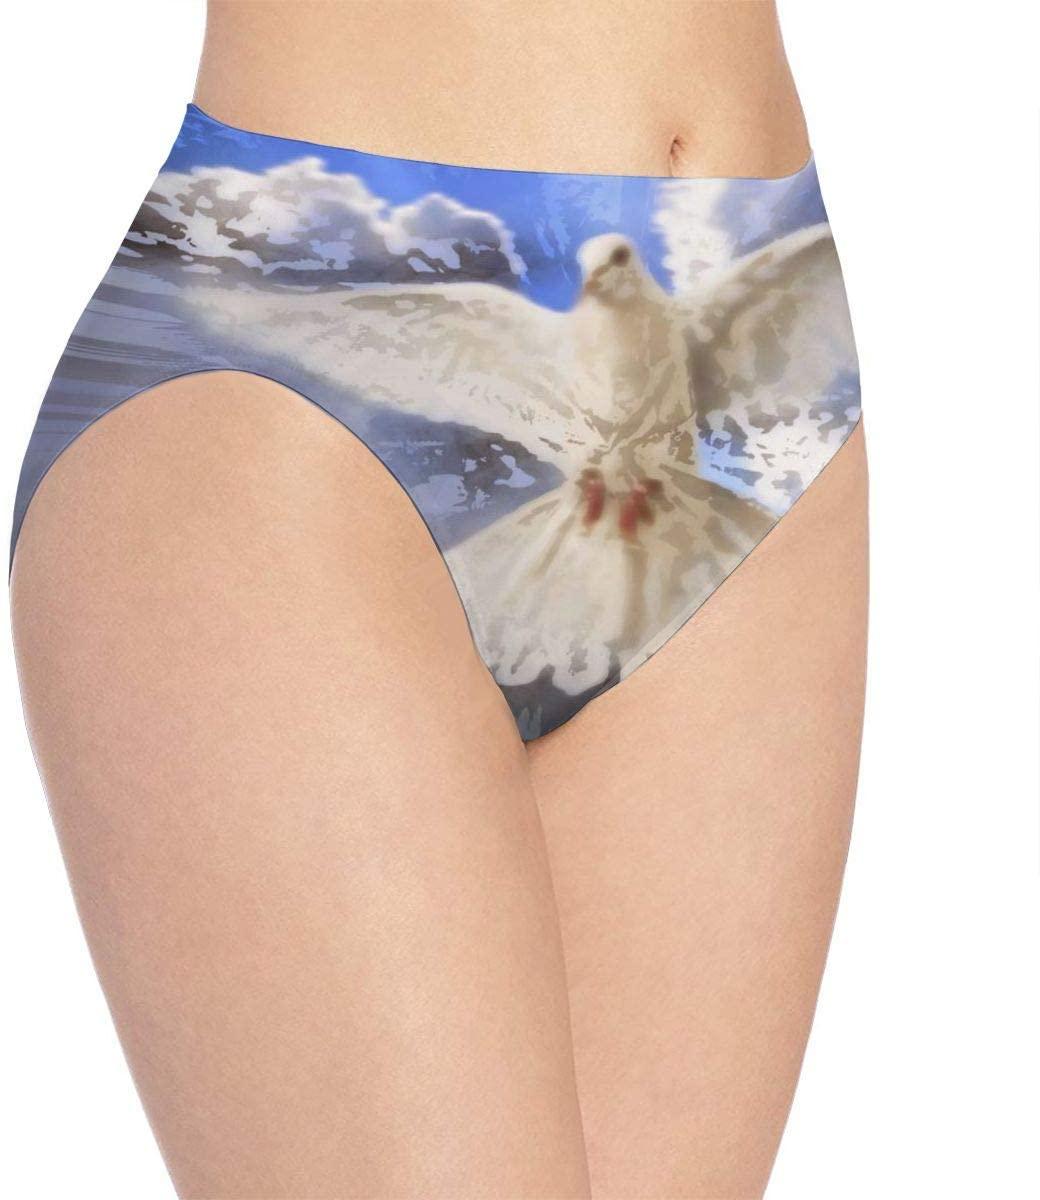 Kjaoi 3D Print Soft Women's Underwear, Dove Painting Fashion Flirty Sexy Lady's Panties Briefs